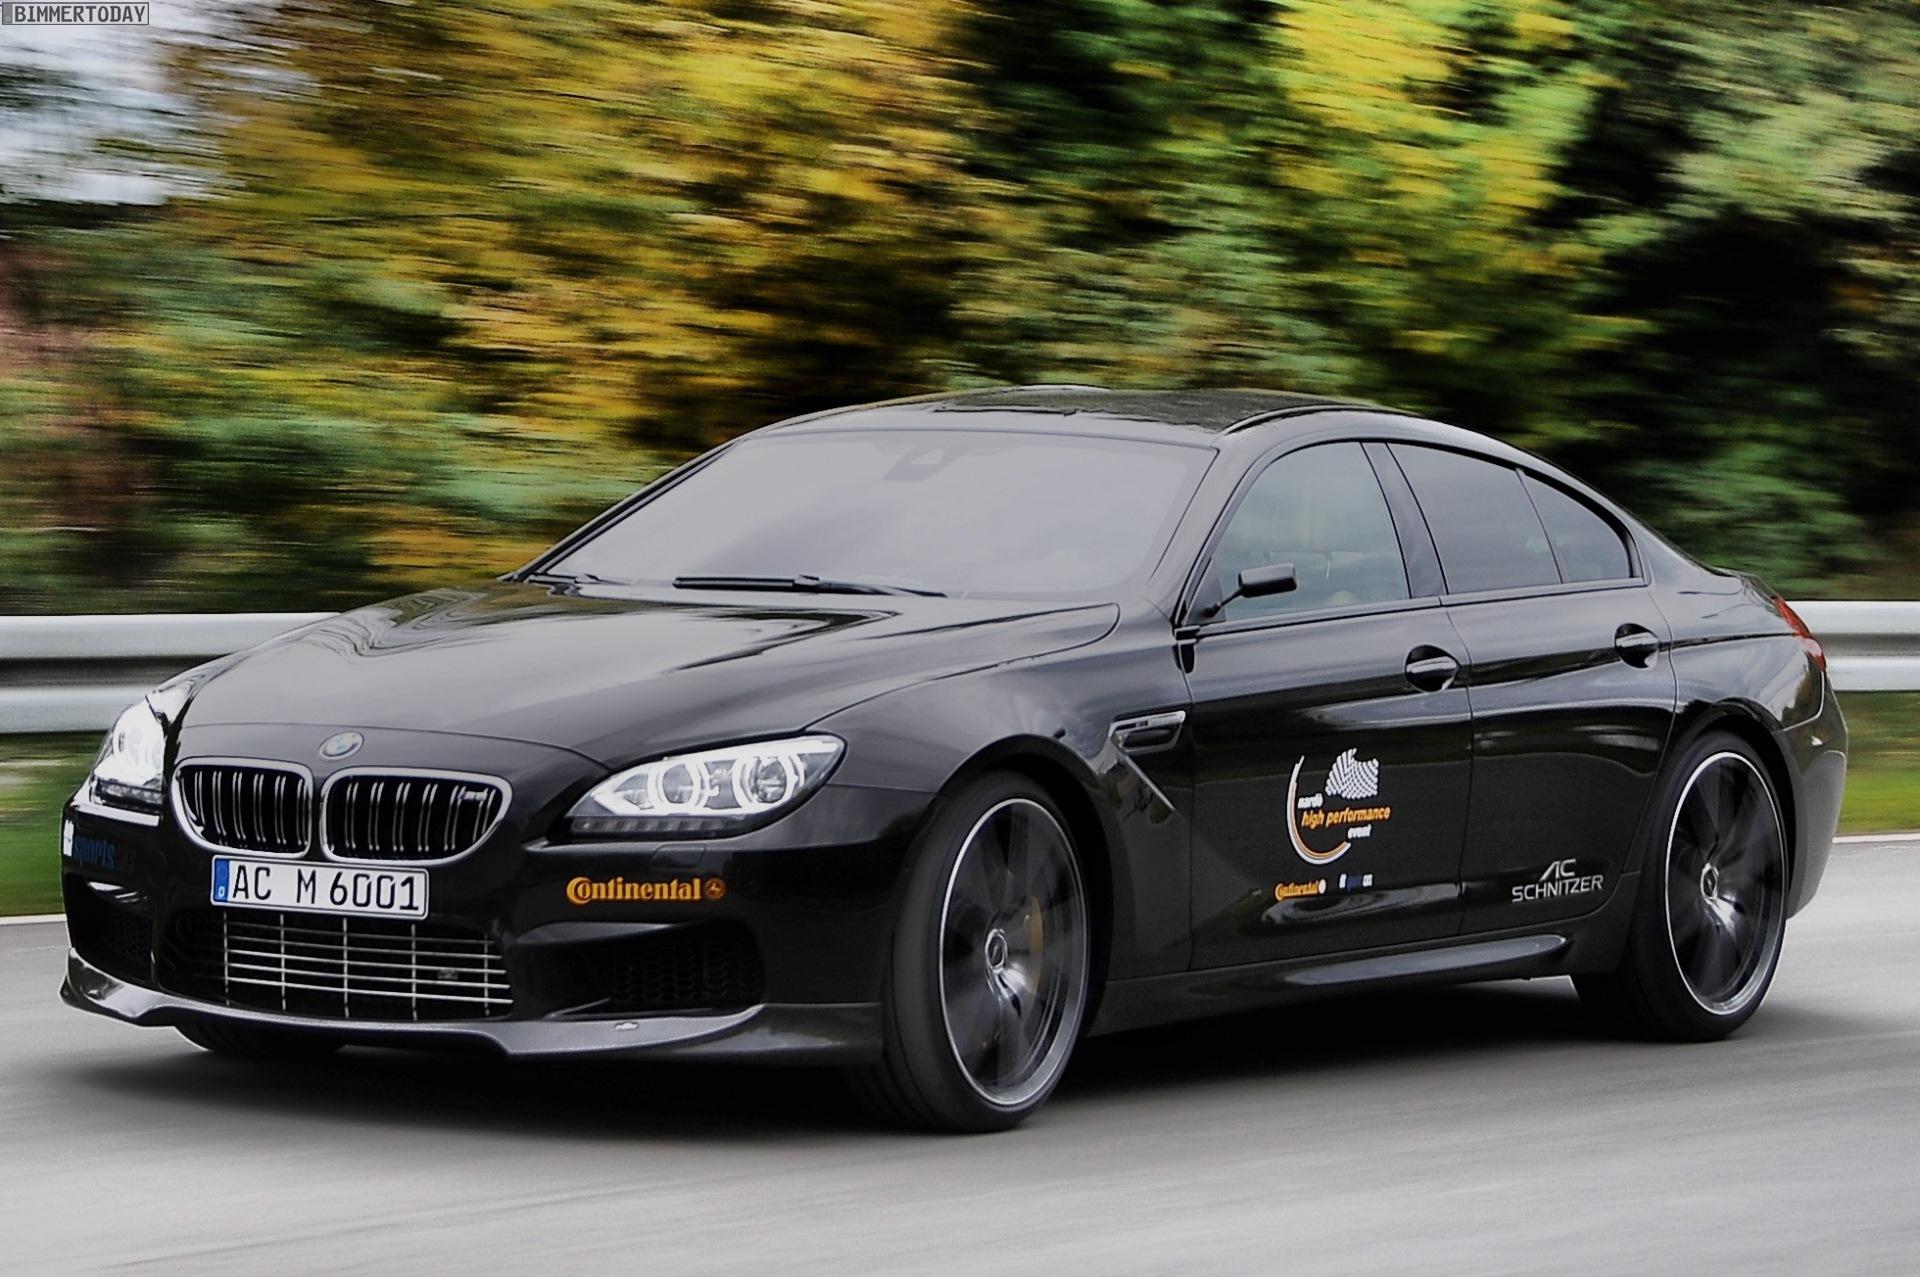 AC Schnitzer BMW M6 Gran Coupe Nardo High Speed Tuning Test 02